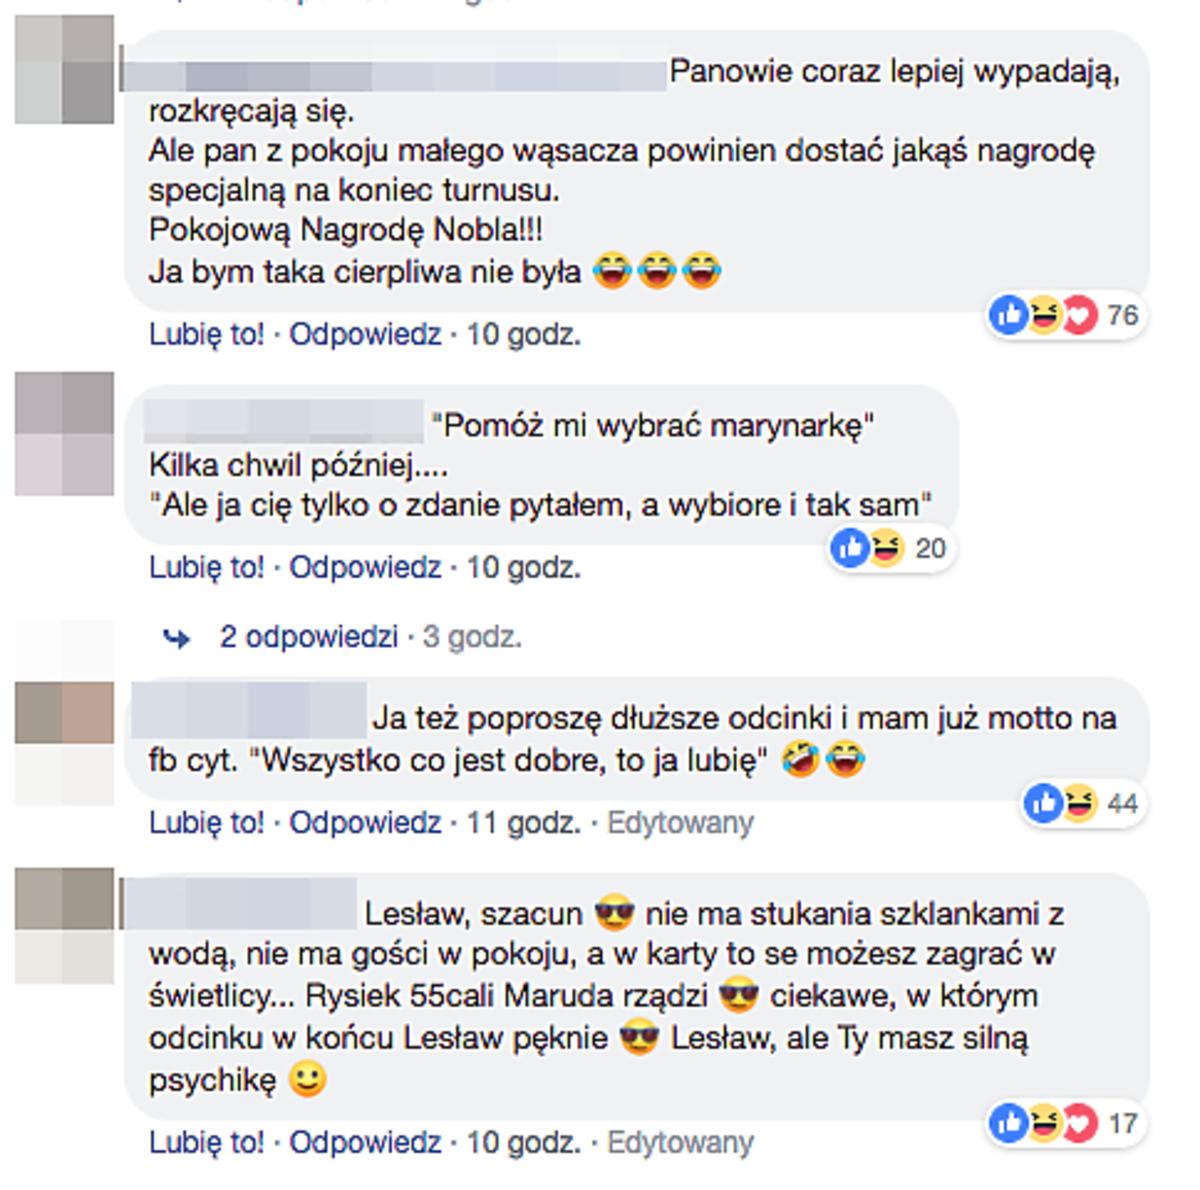 Komentarze po Sanatorium Miłości